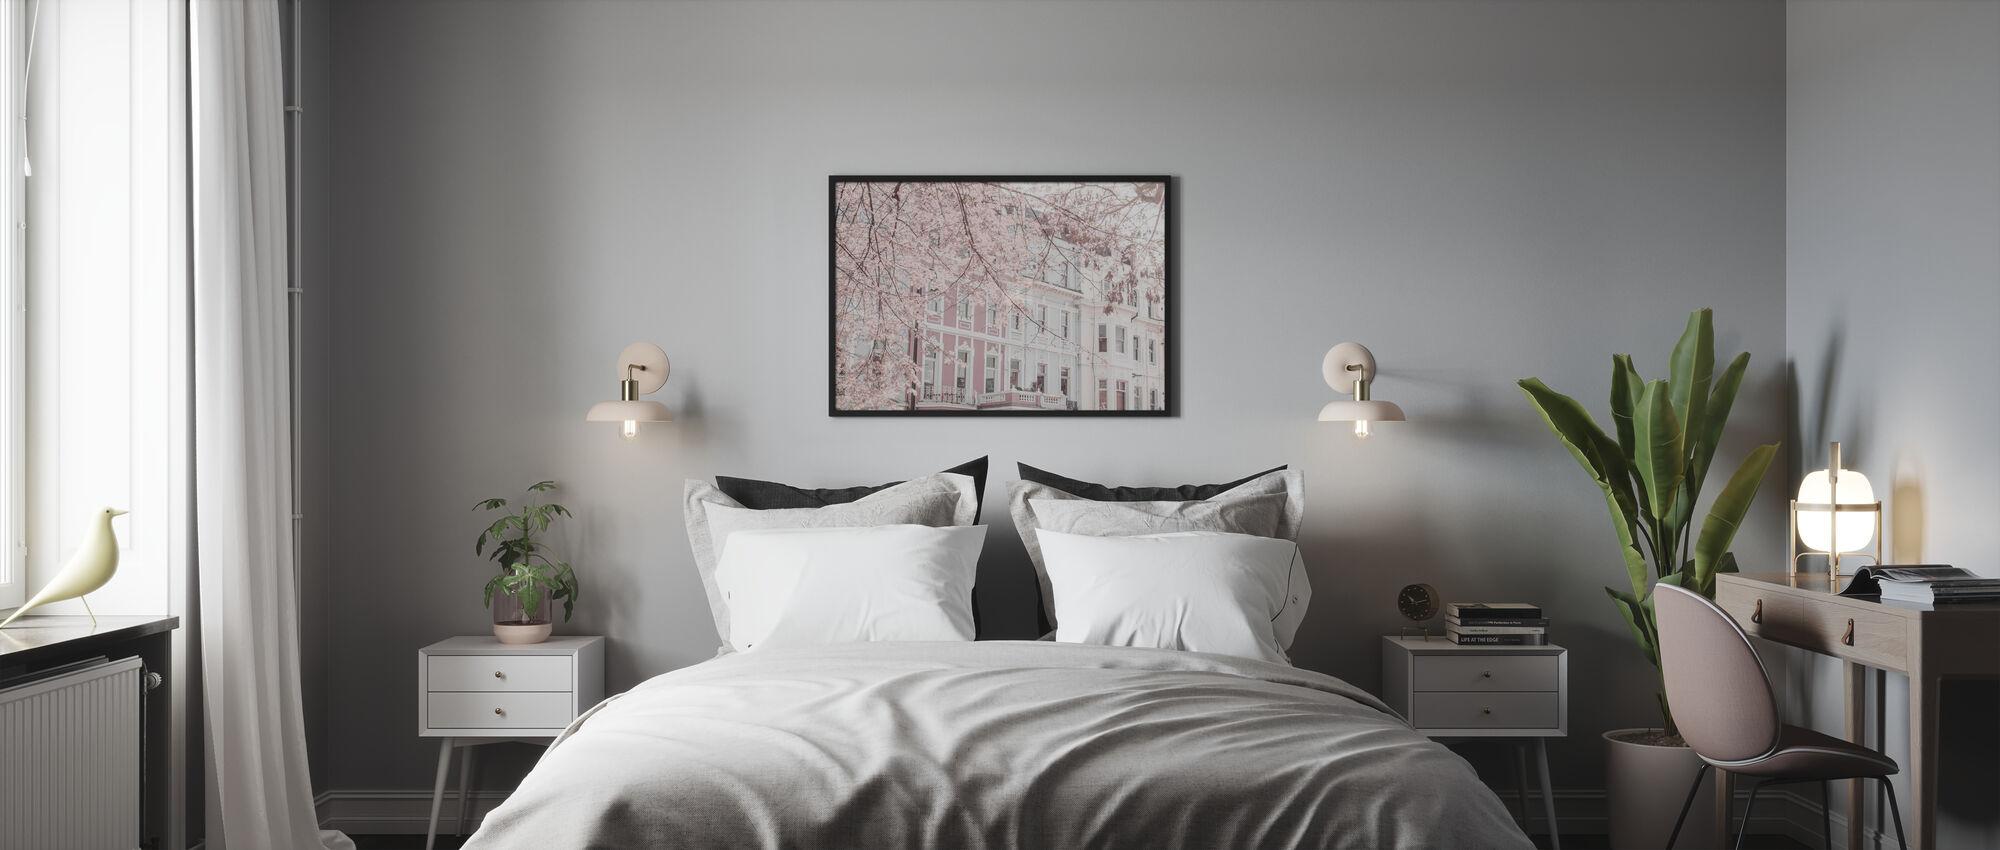 Dimmed London - Inramad tavla - Sovrum